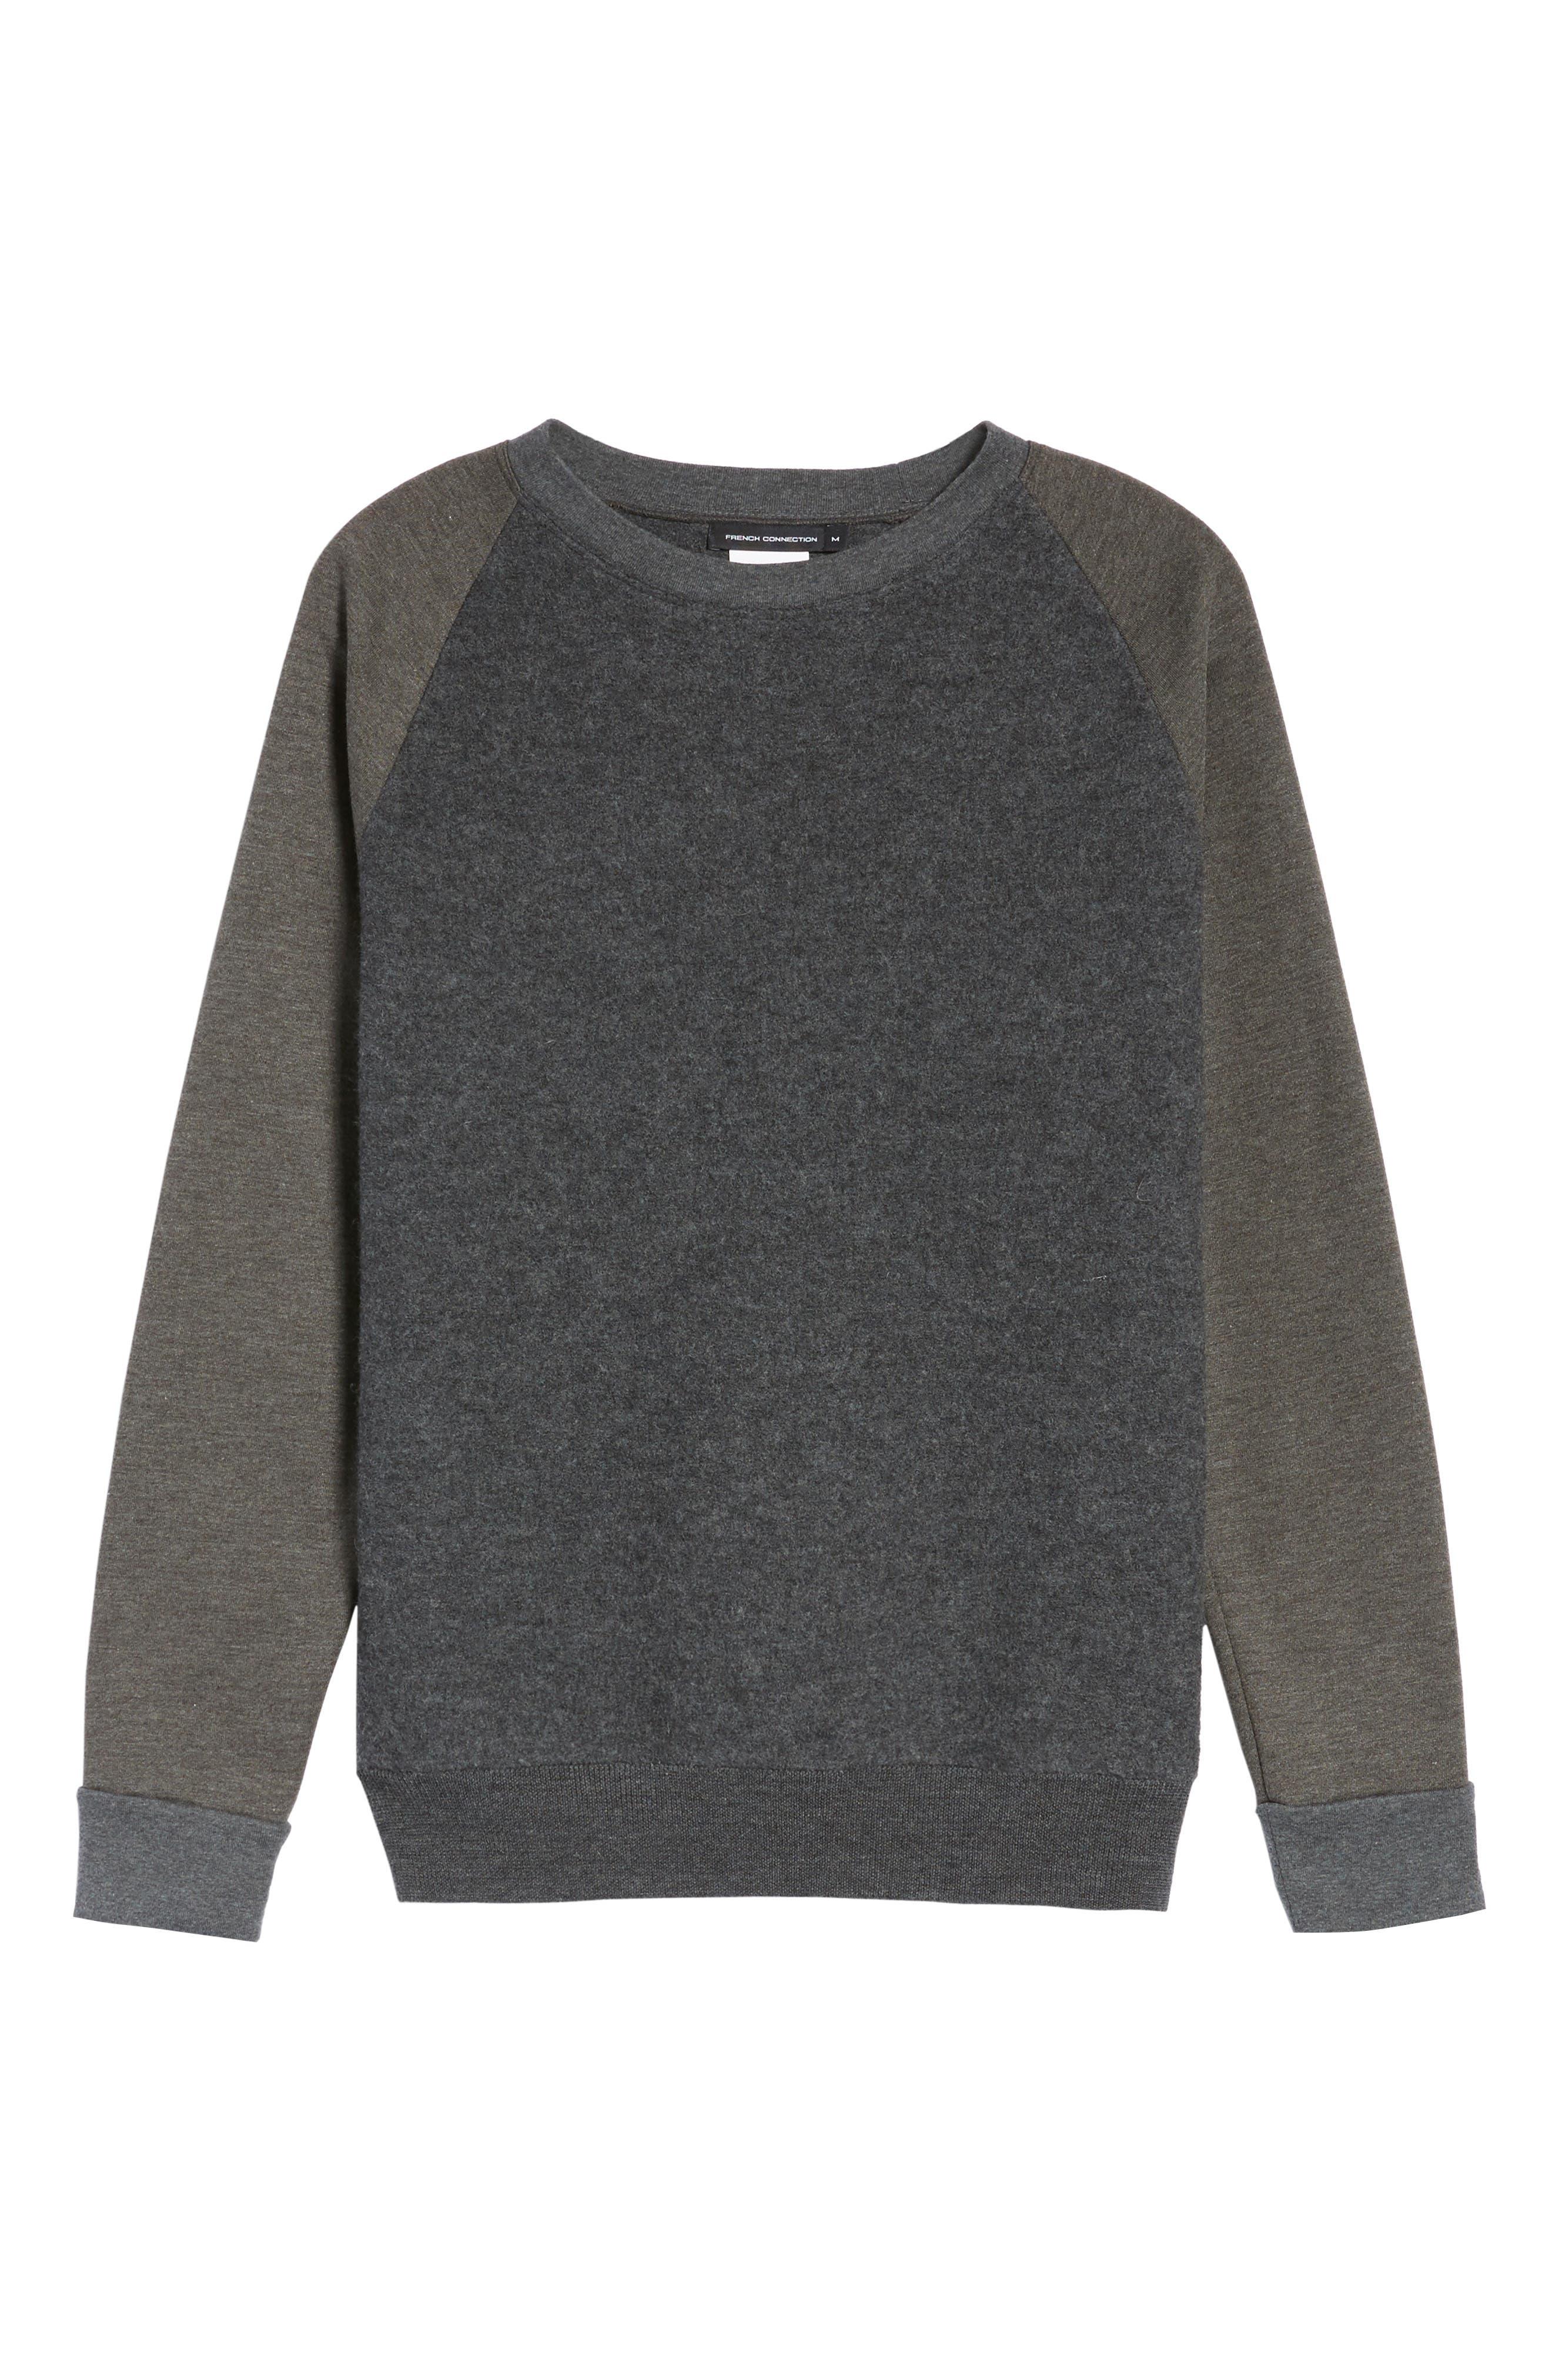 Crewneck Sweater,                             Alternate thumbnail 6, color,